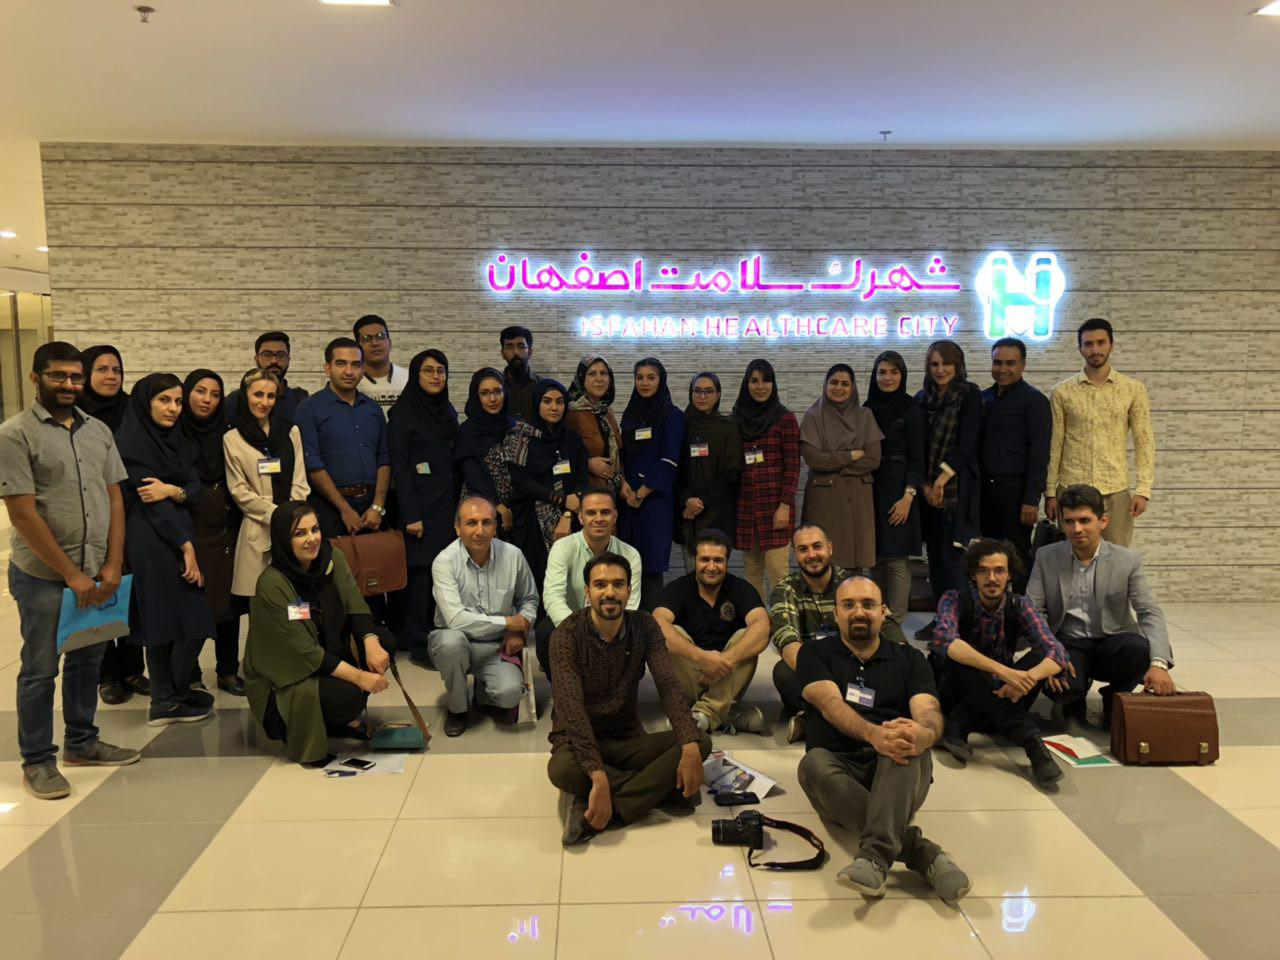 استارتاپ ویکند گردشگری سلامت اصفهان